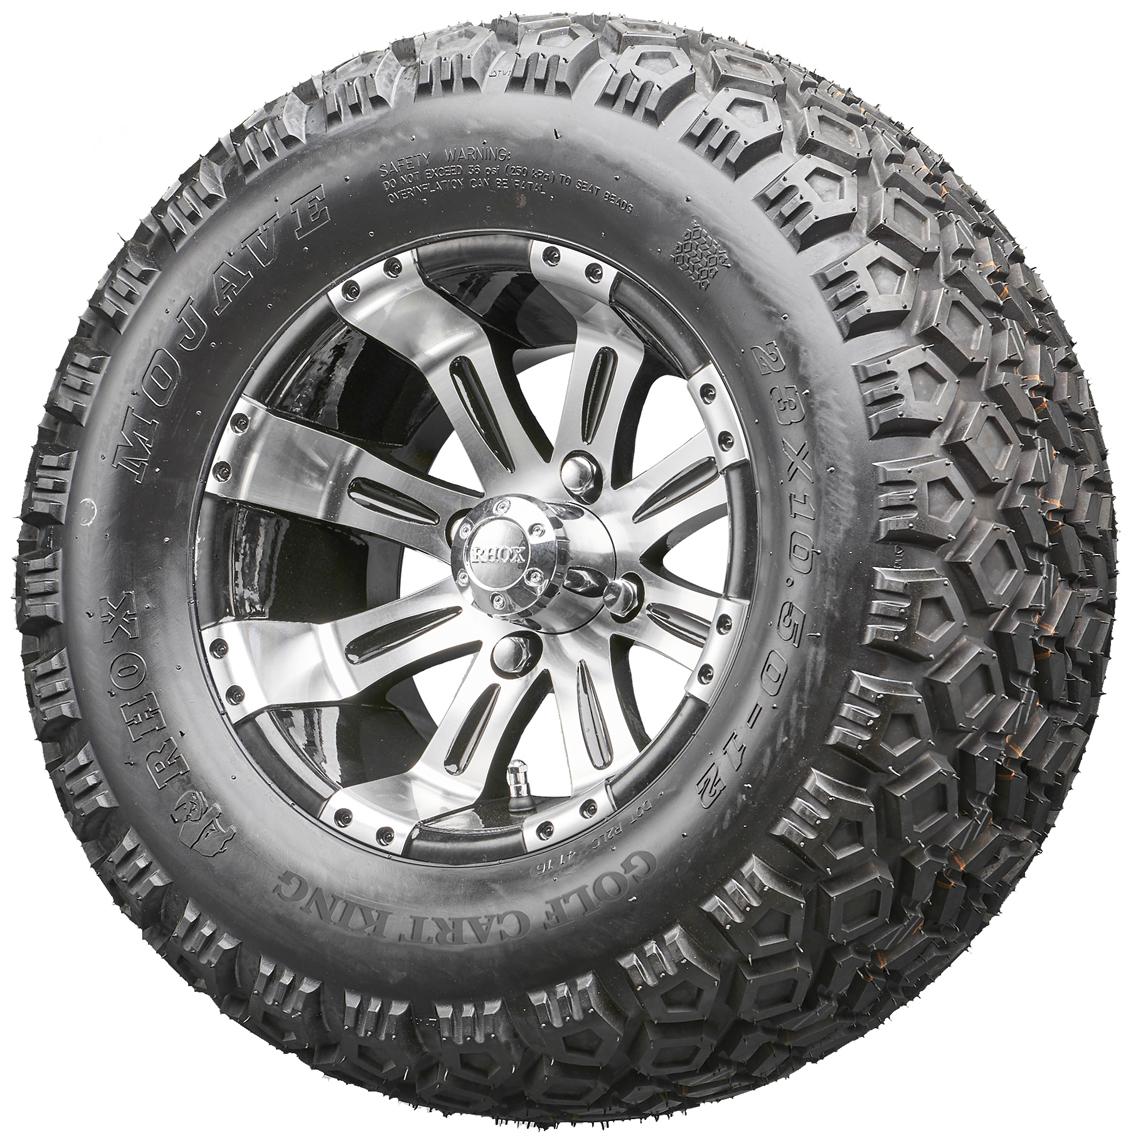 d0cf4e466a3 Golf Cart Wheels and Tires - RHOX RX180 Machined 12